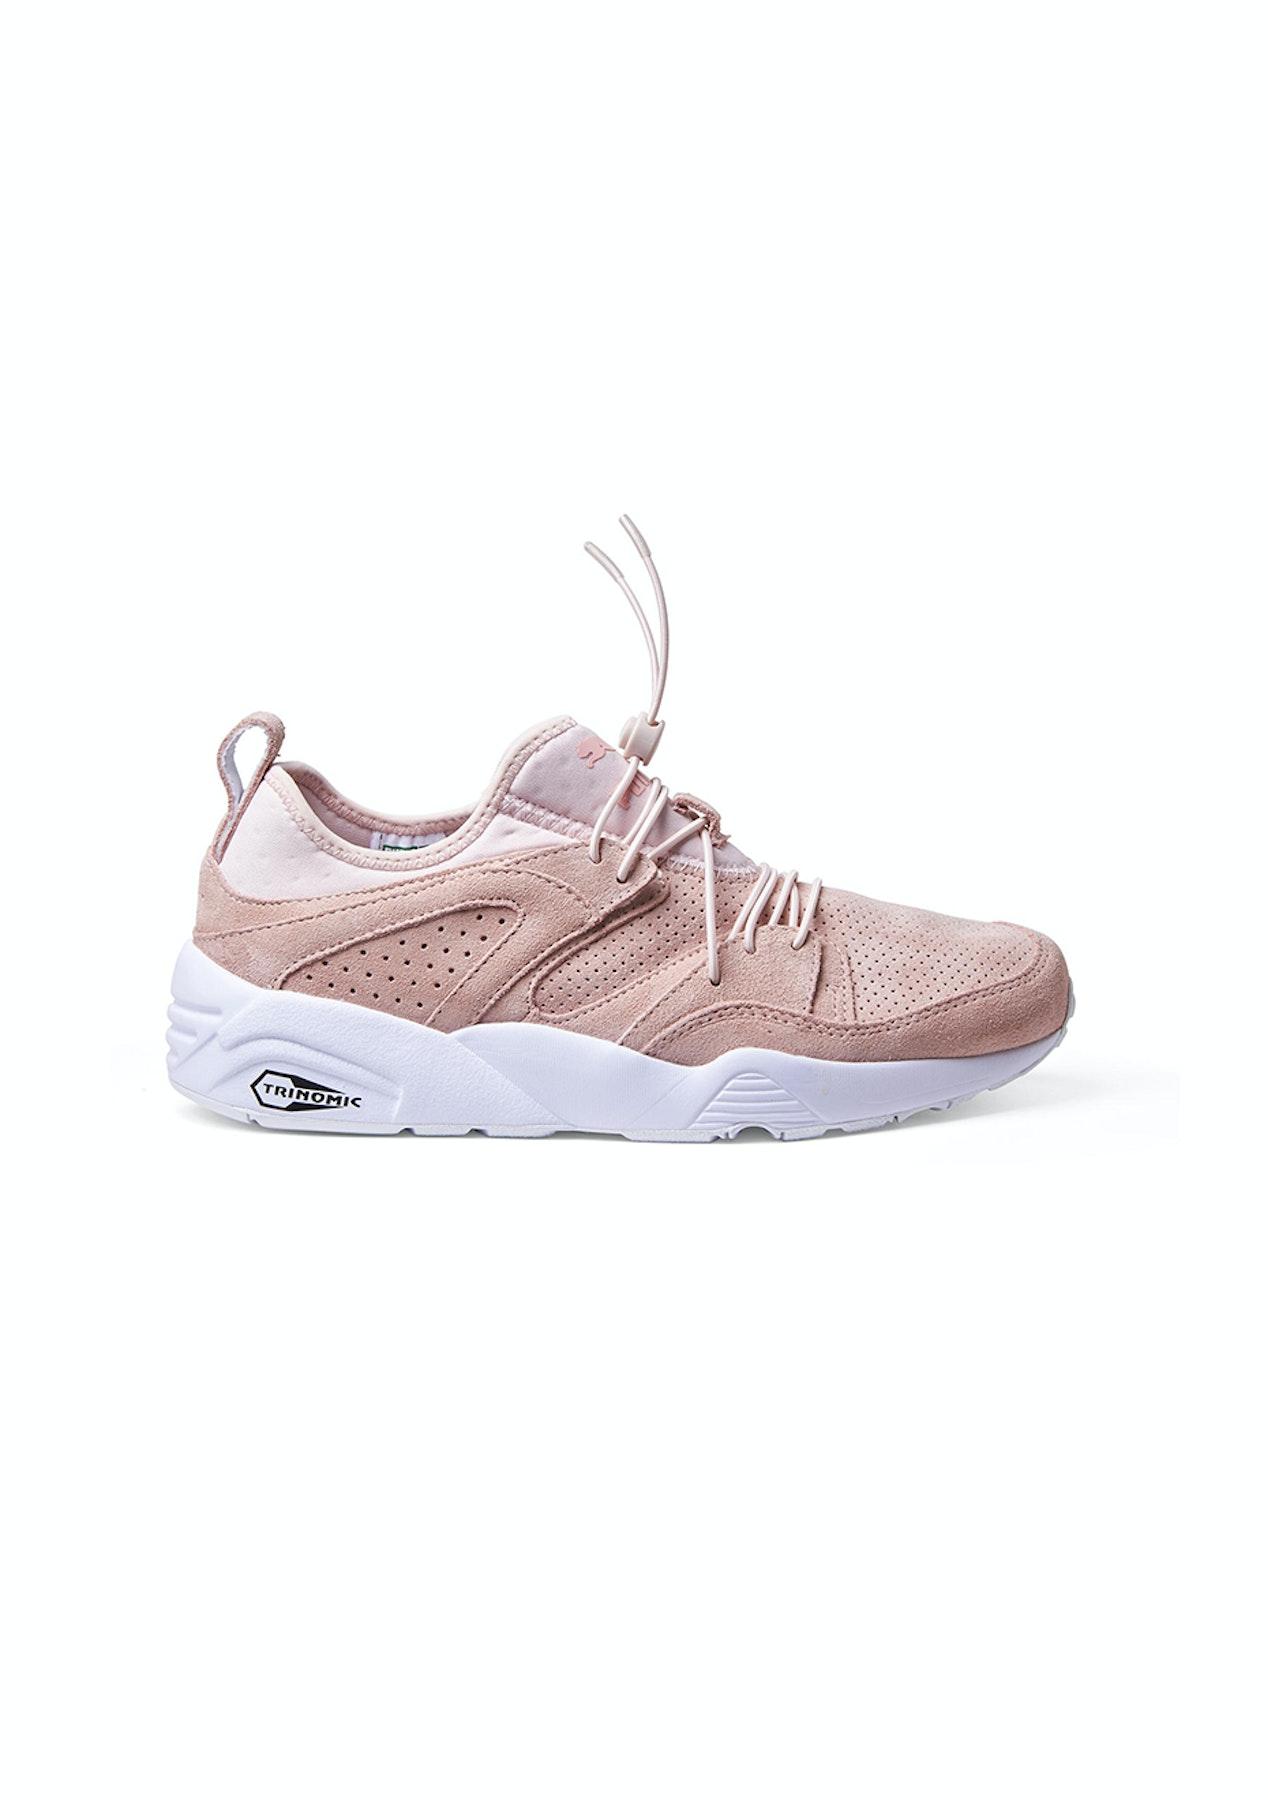 Puma Womens - Blaze Of Glory Soft Pink - Free Shipping Puma   More - Onceit abf0172eb8bc